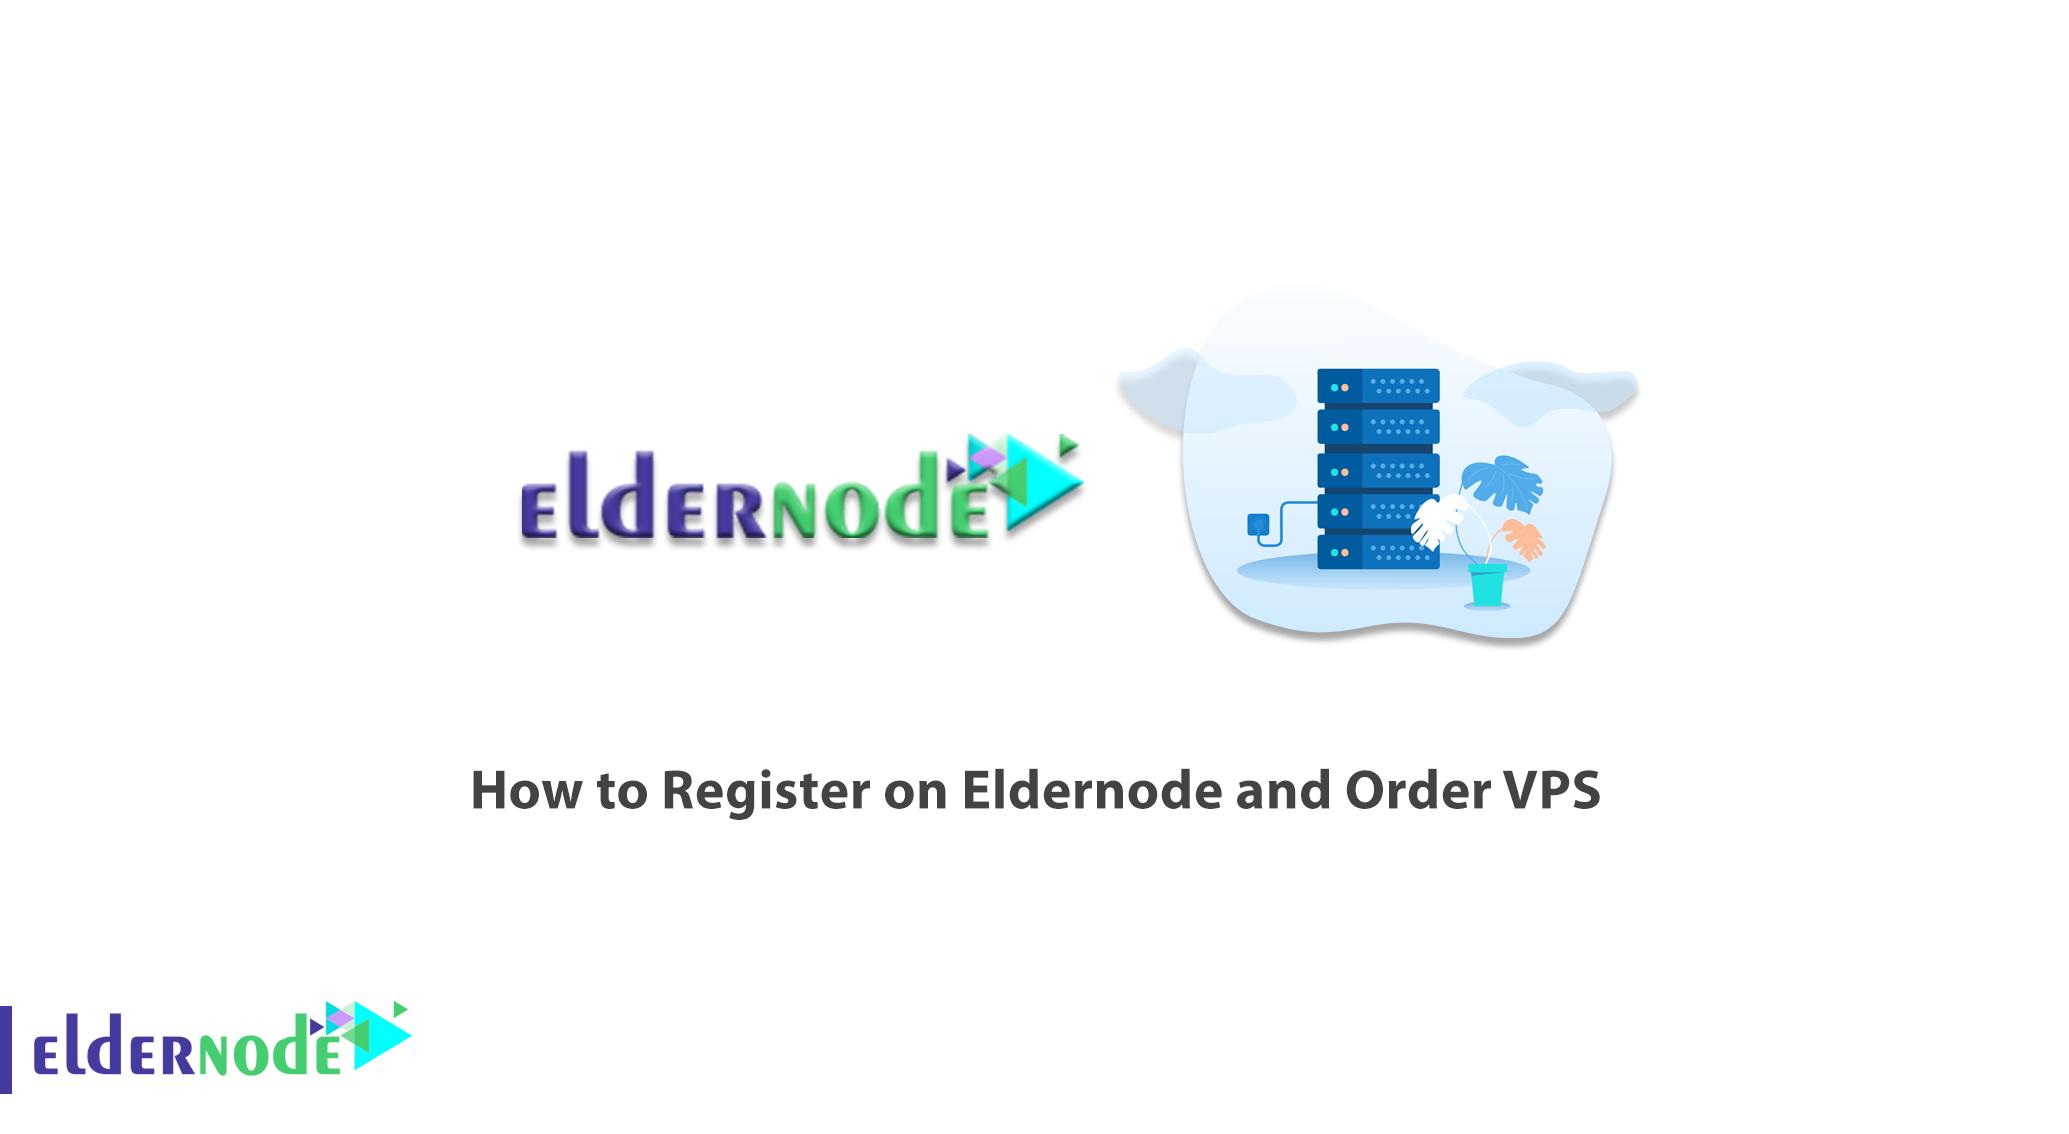 How to Register on Eldernode and Order VPS